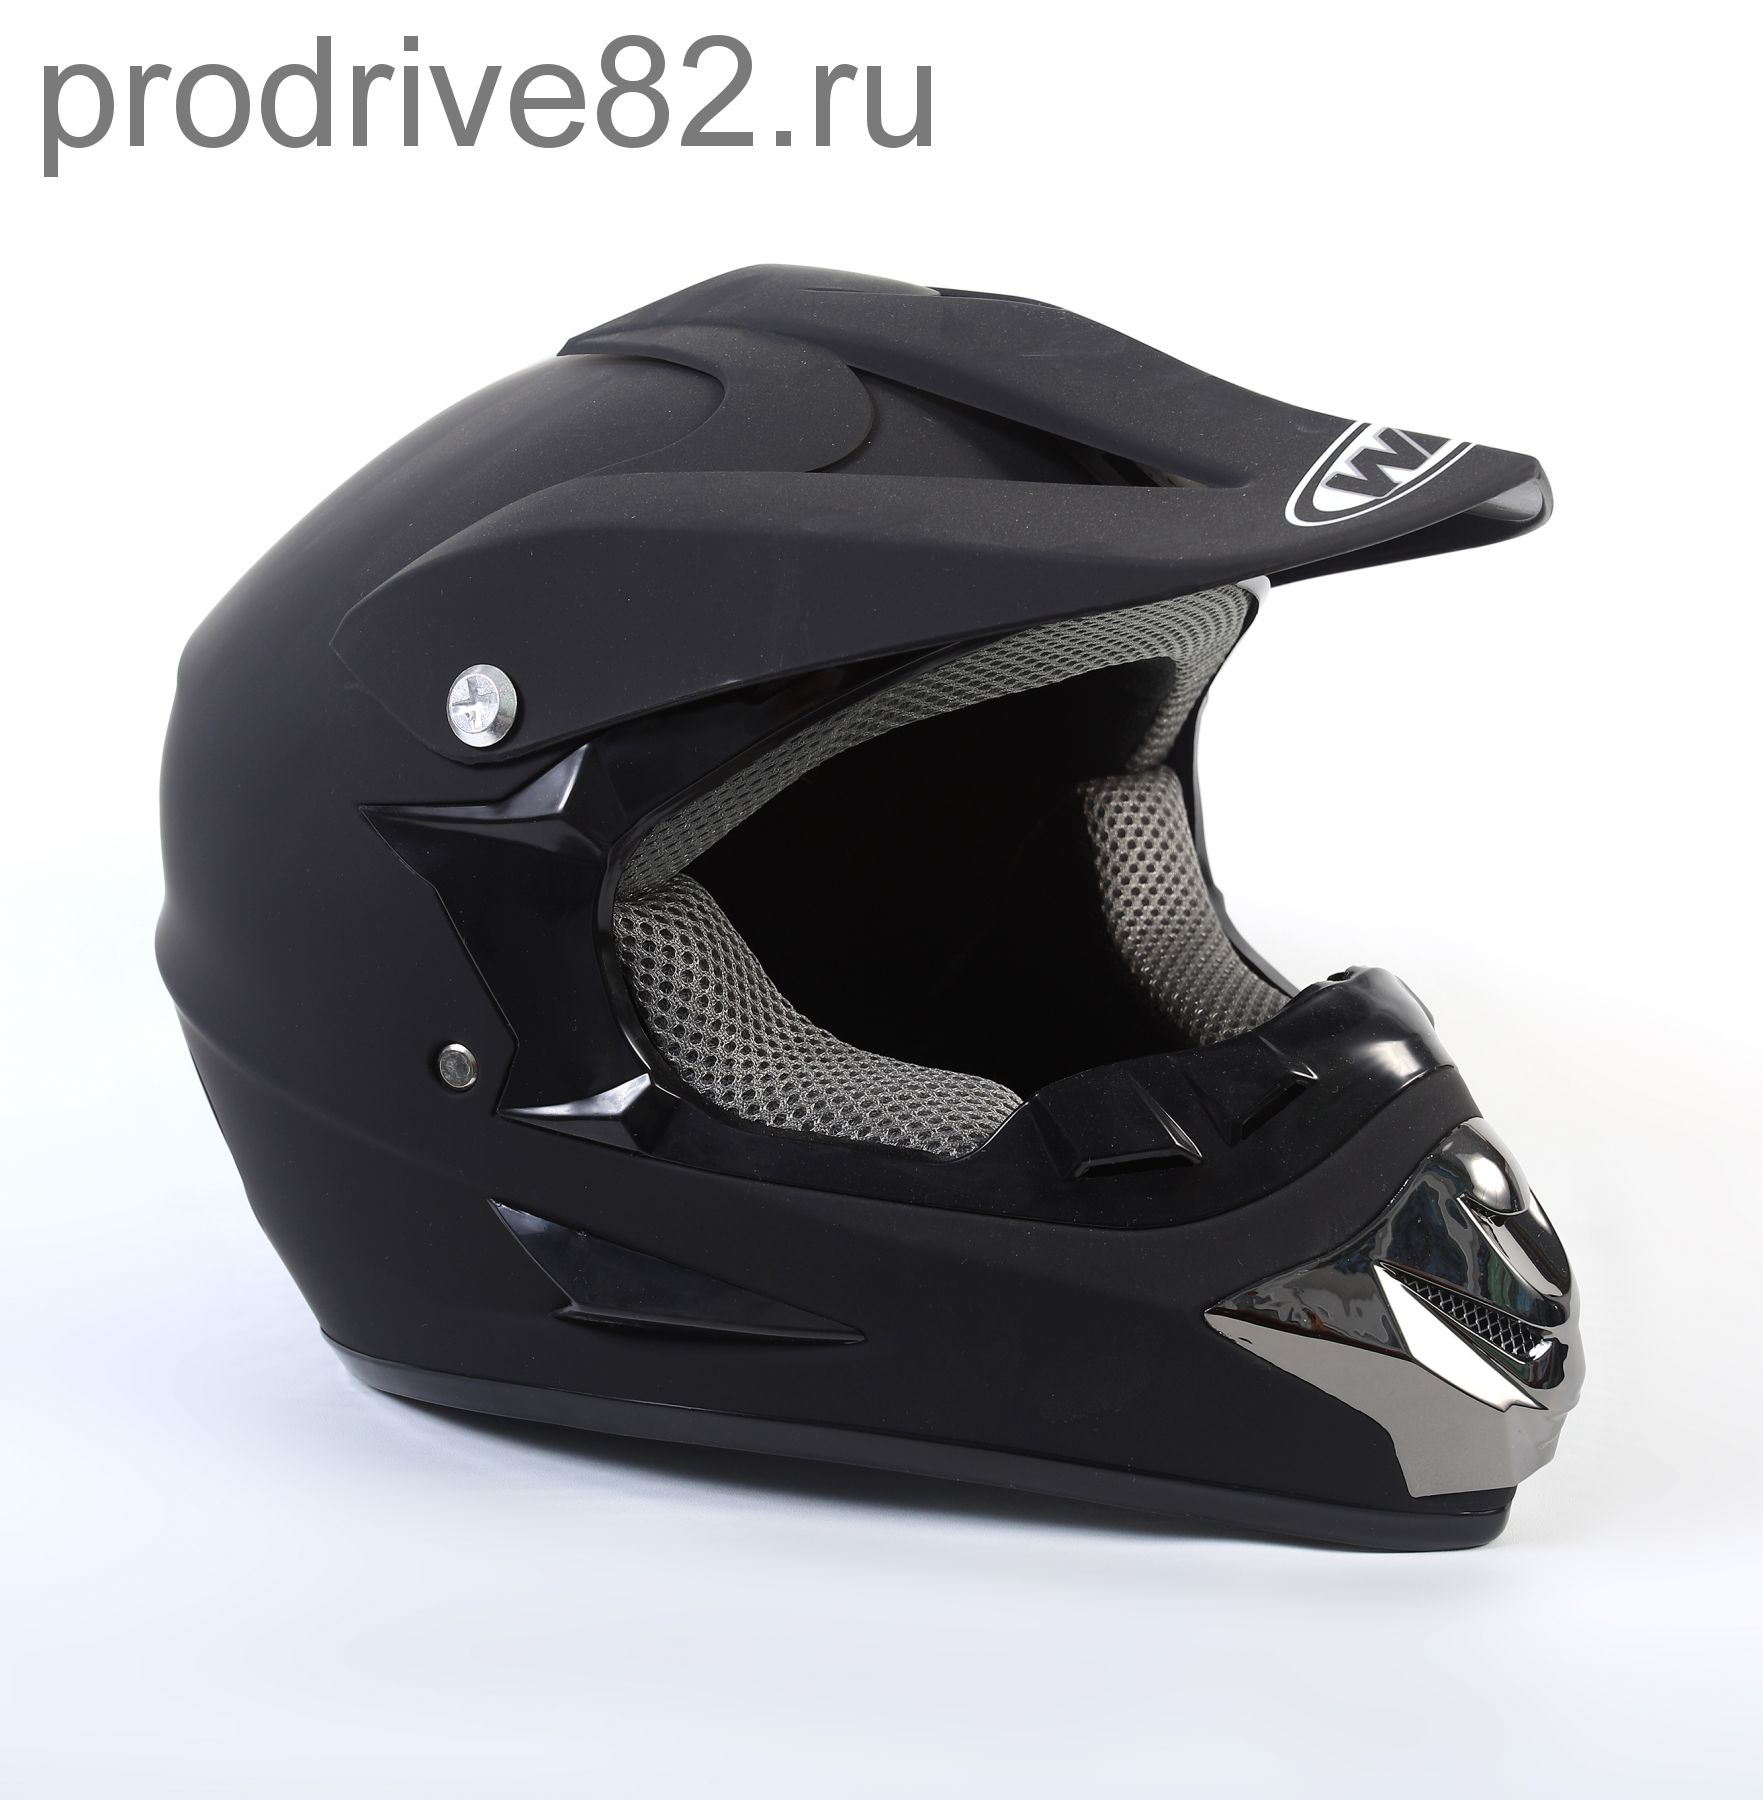 Шлем кроссовый WLT Black